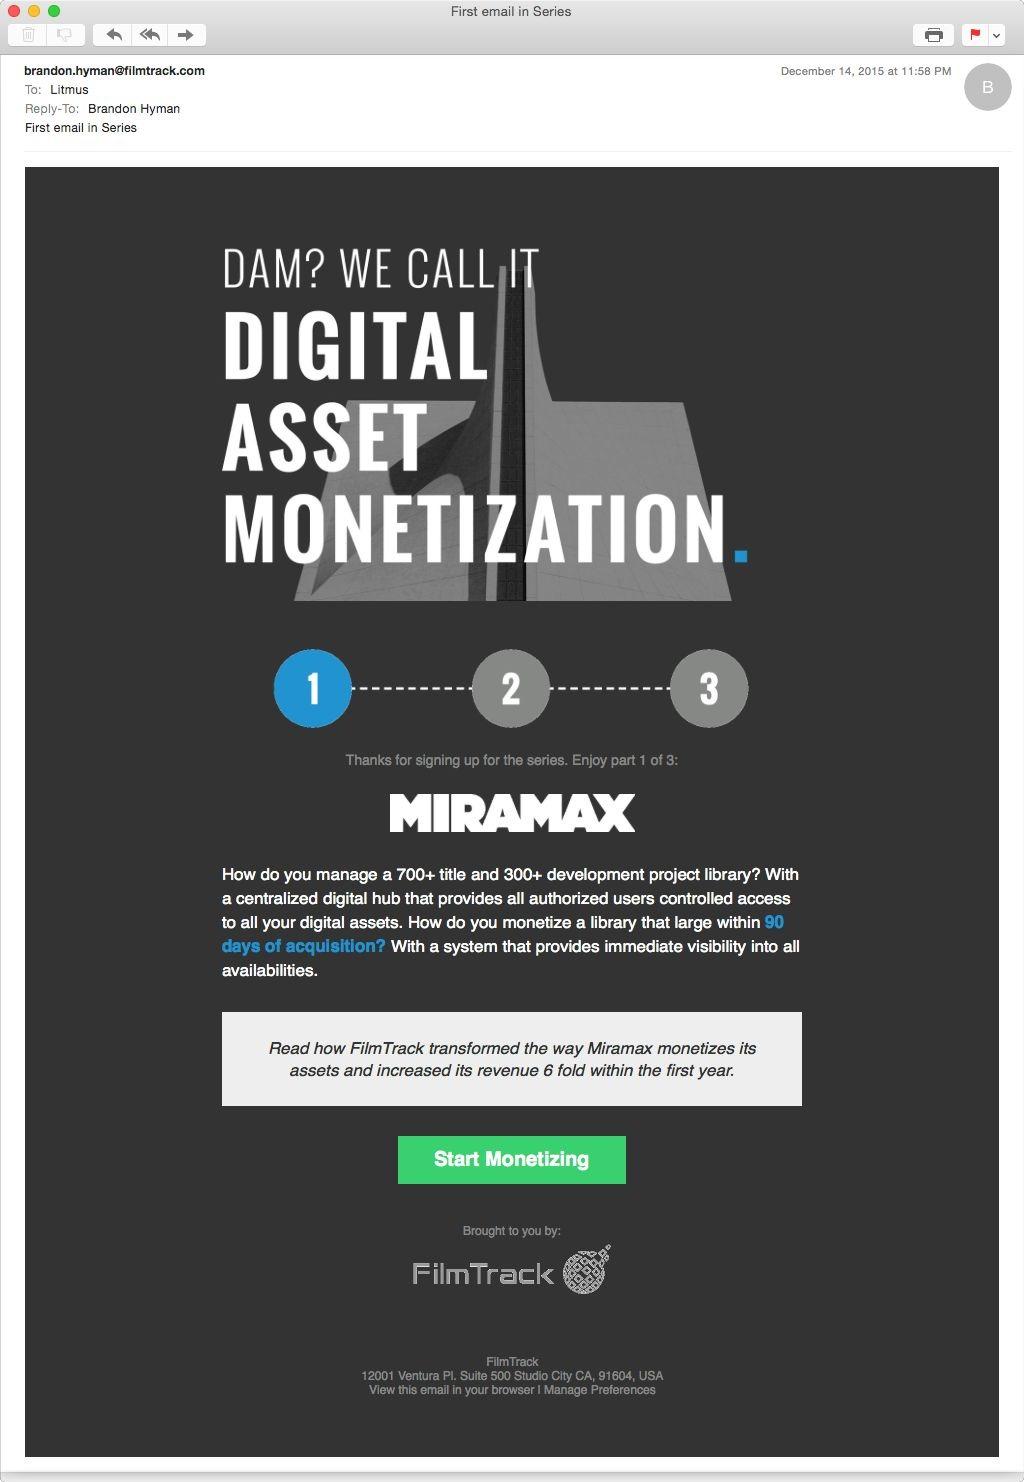 first email in a series call Digital Asset Monetization